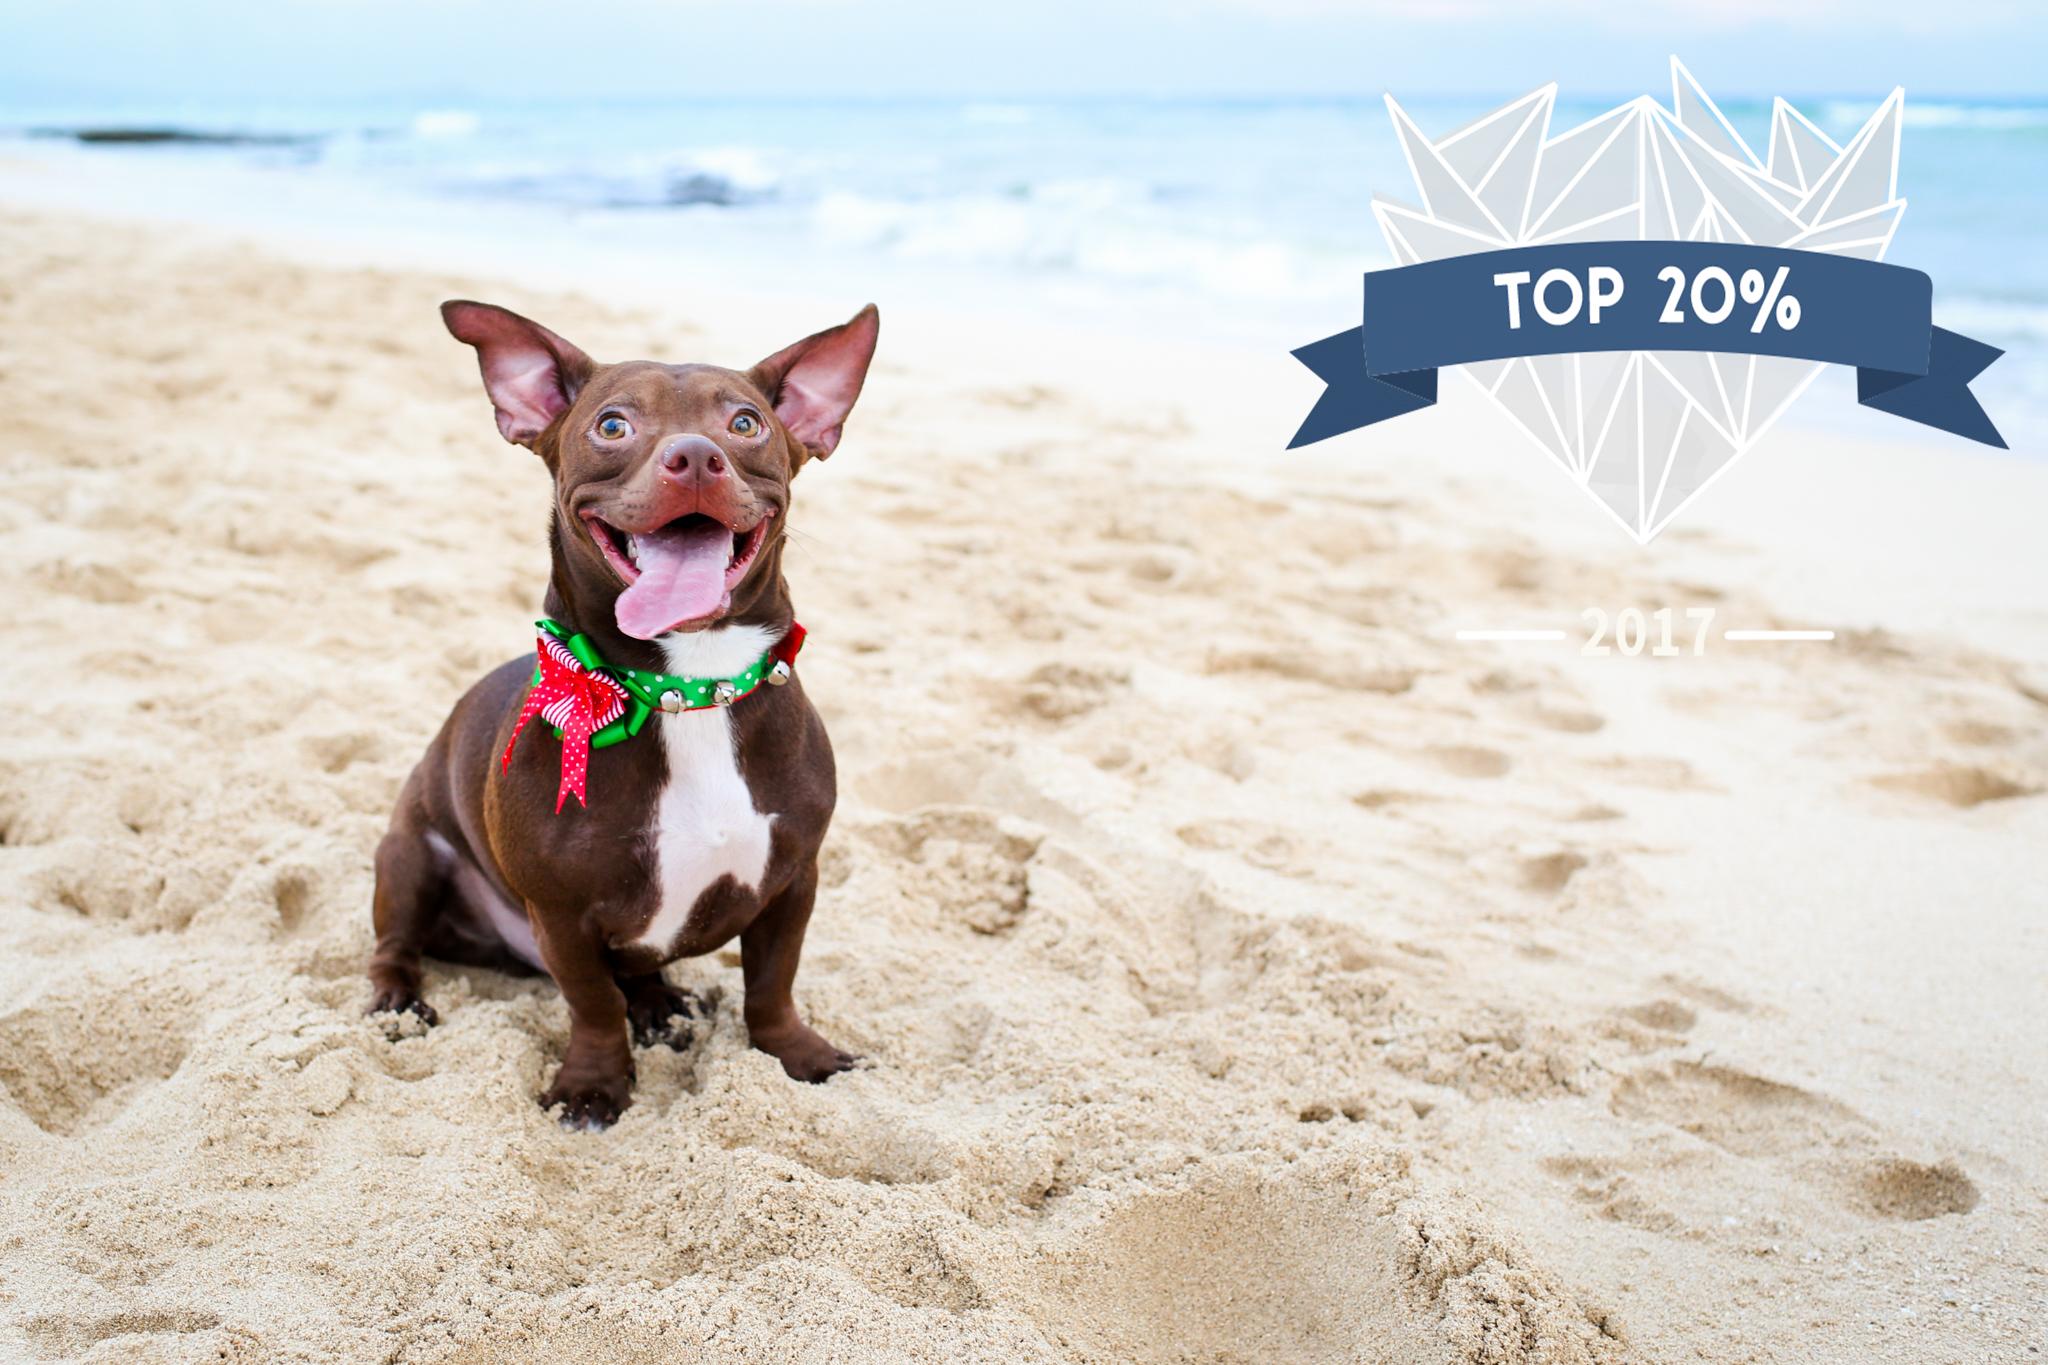 non watermarked 2017 shoot and share photo awards aloha sunshine photography 7November 20, 2016.jpg